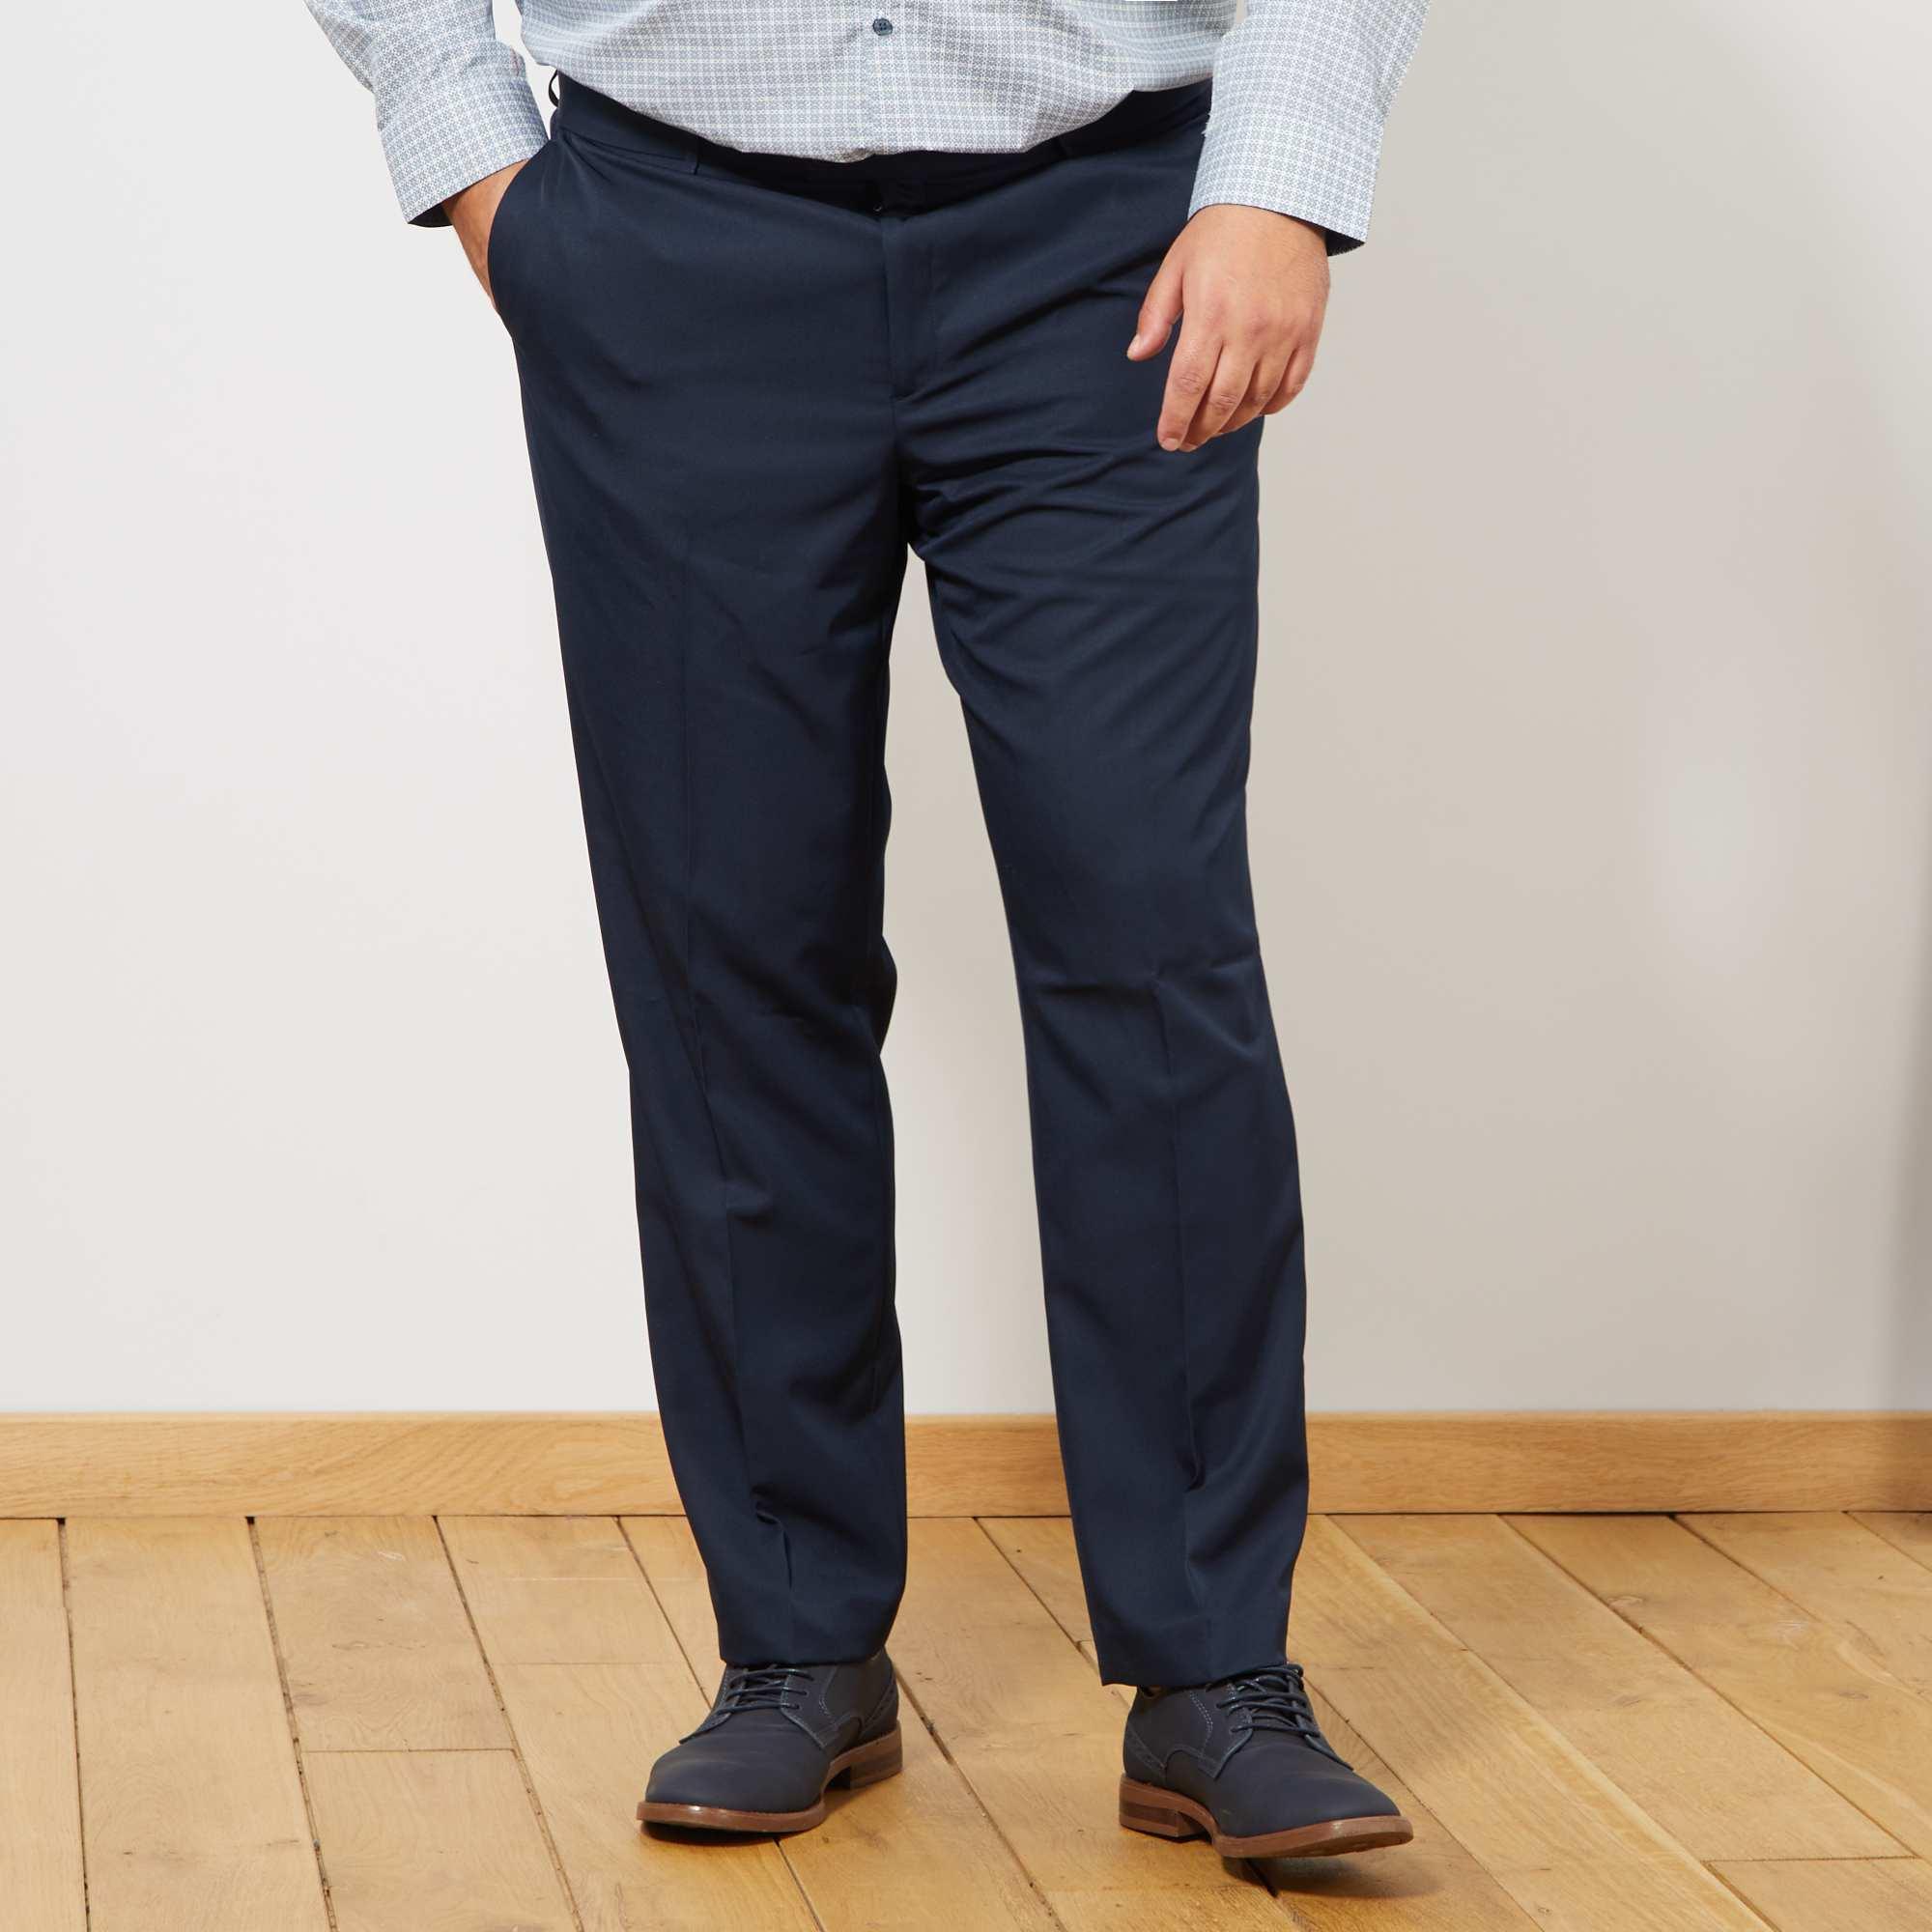 Pantalón de traje liso Tallas grandes hombre - azul marino - Kiabi ... 9b9498c7c40